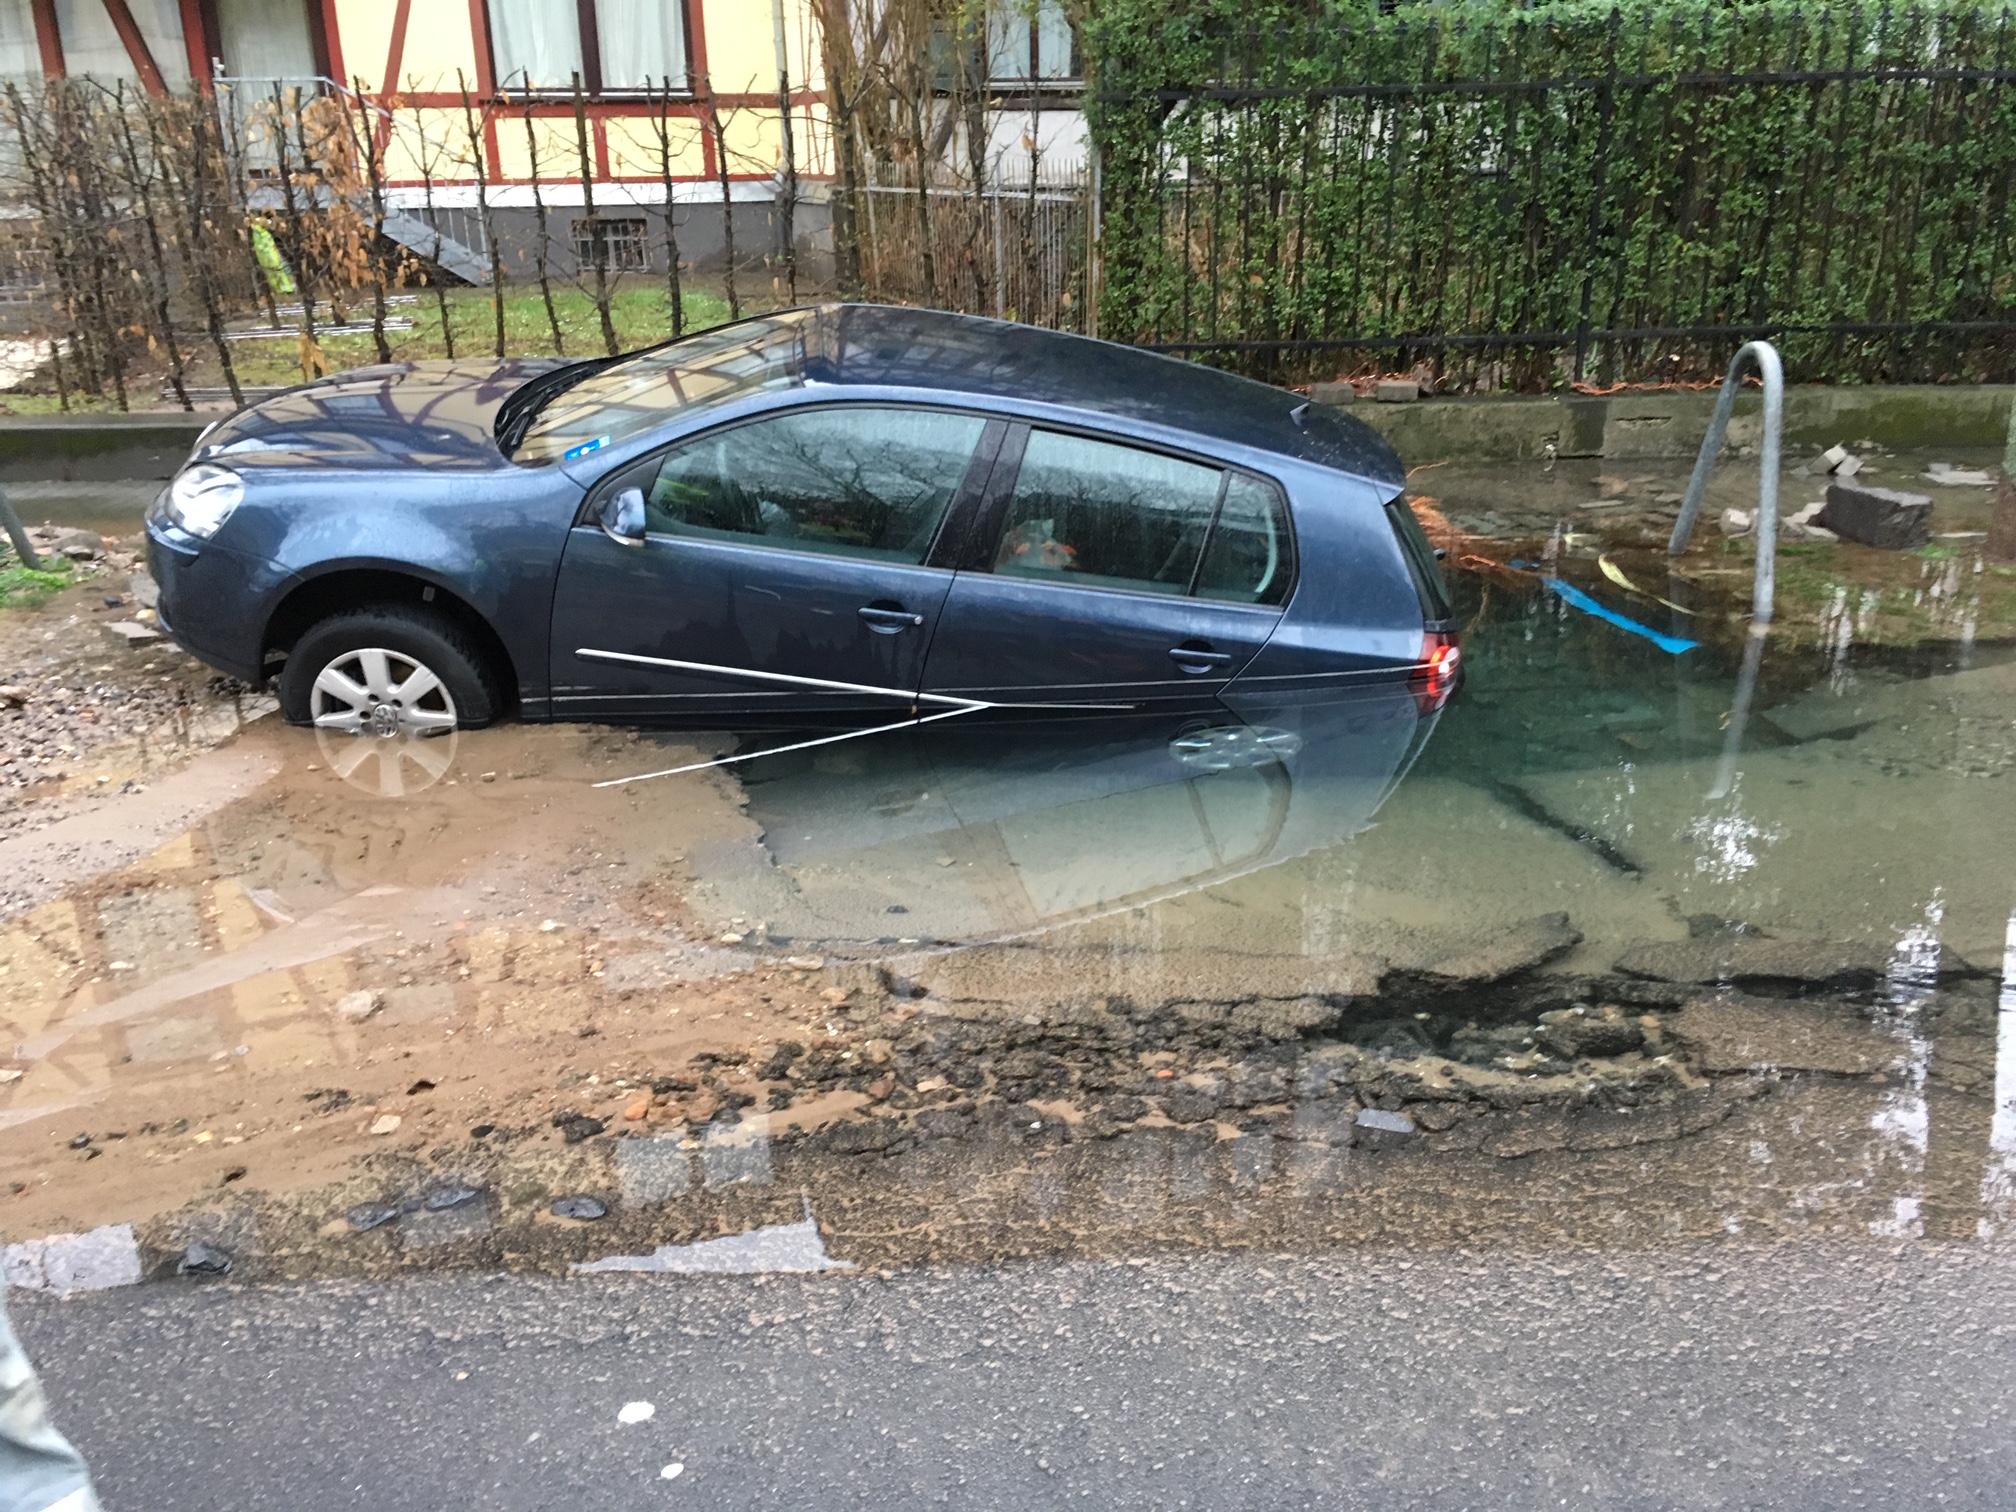 16_03_2019-Wasserrohrbruch-10